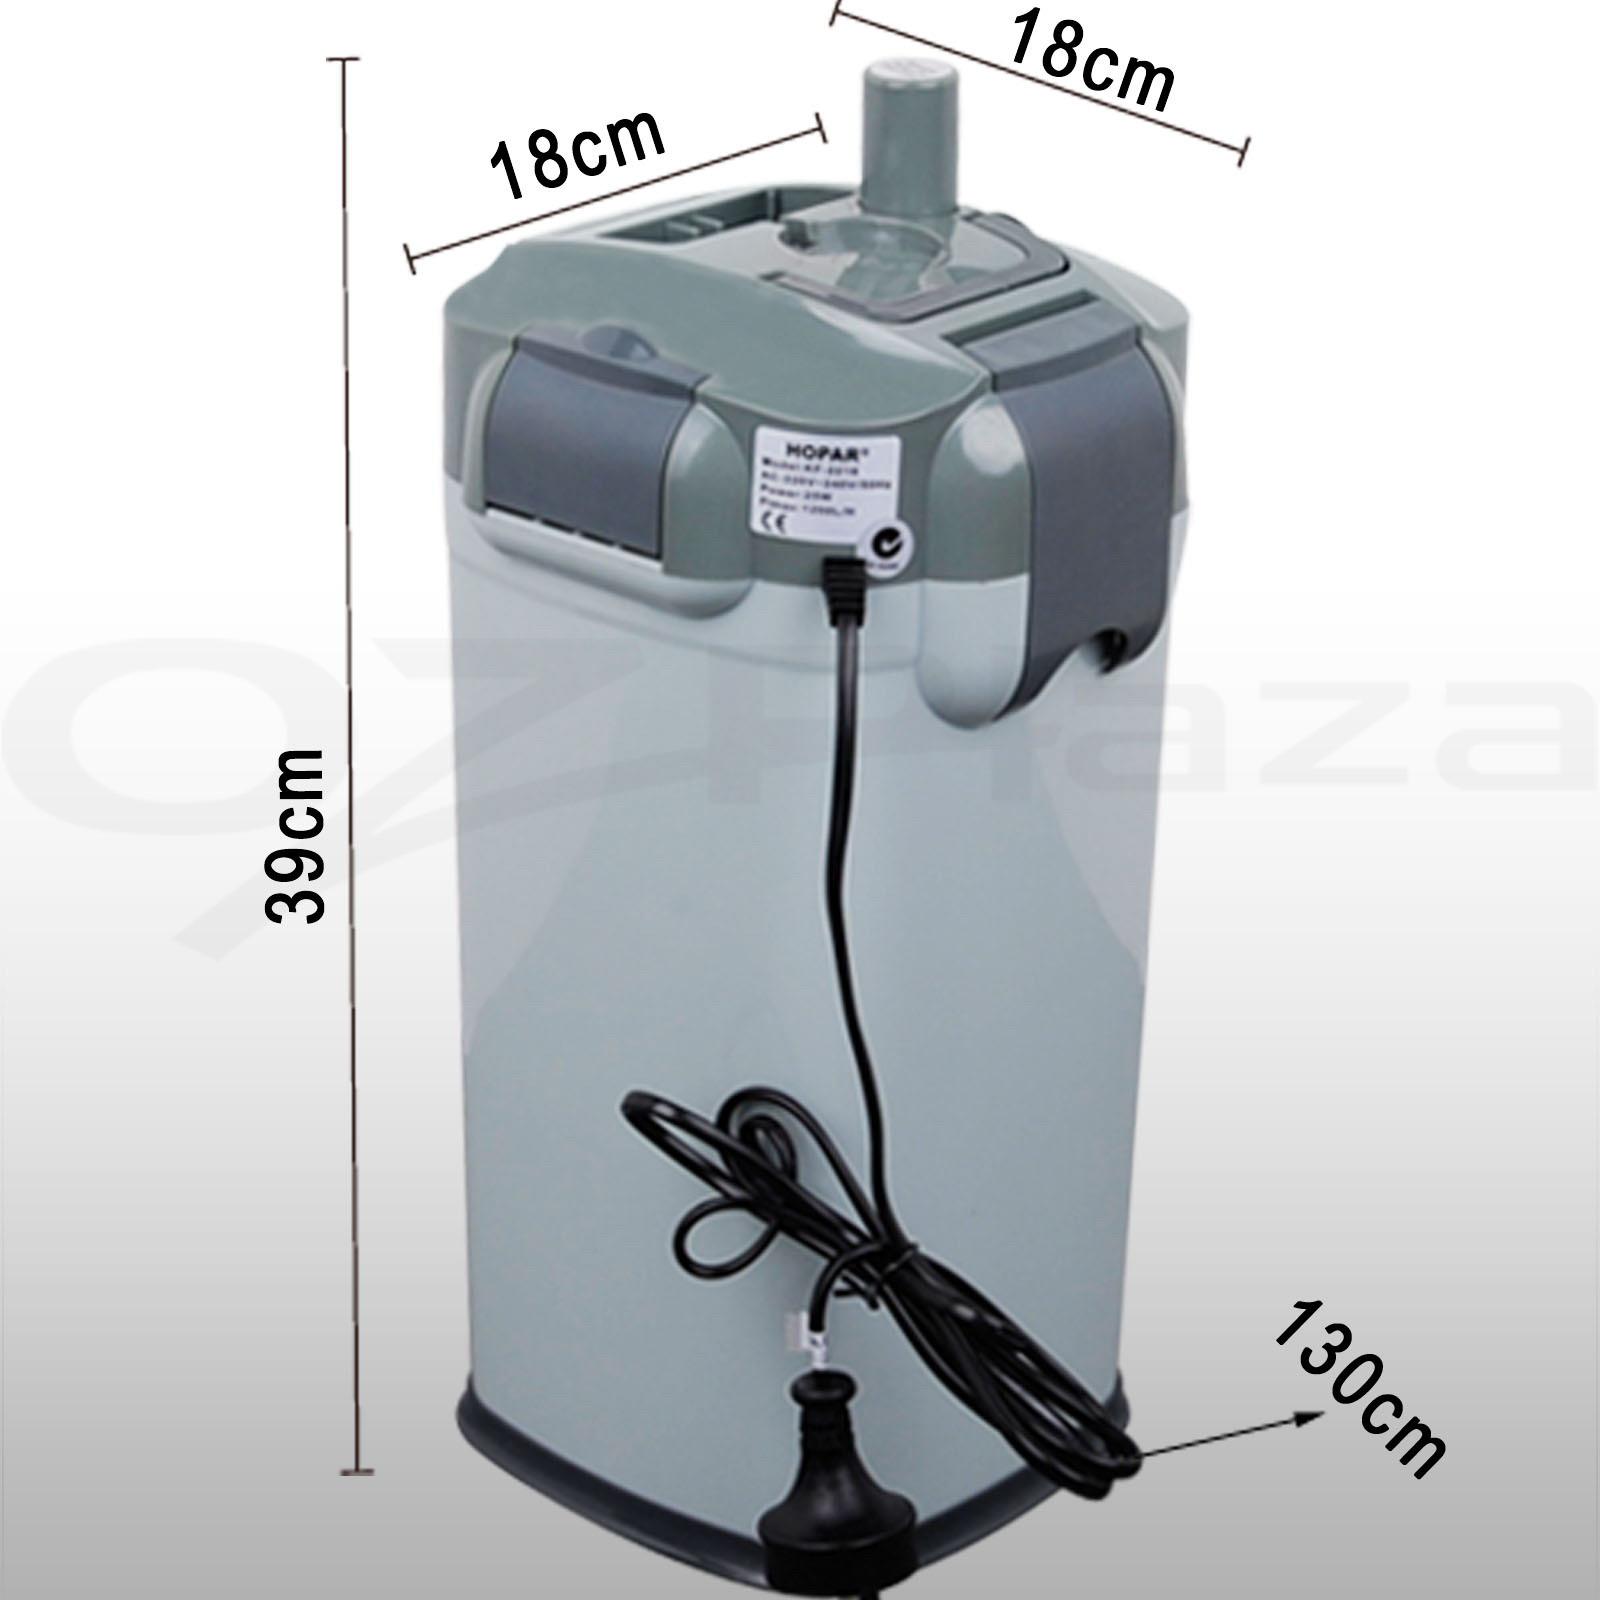 Fish tank aquarium filter sponge aqua external canister for External fish tank filter